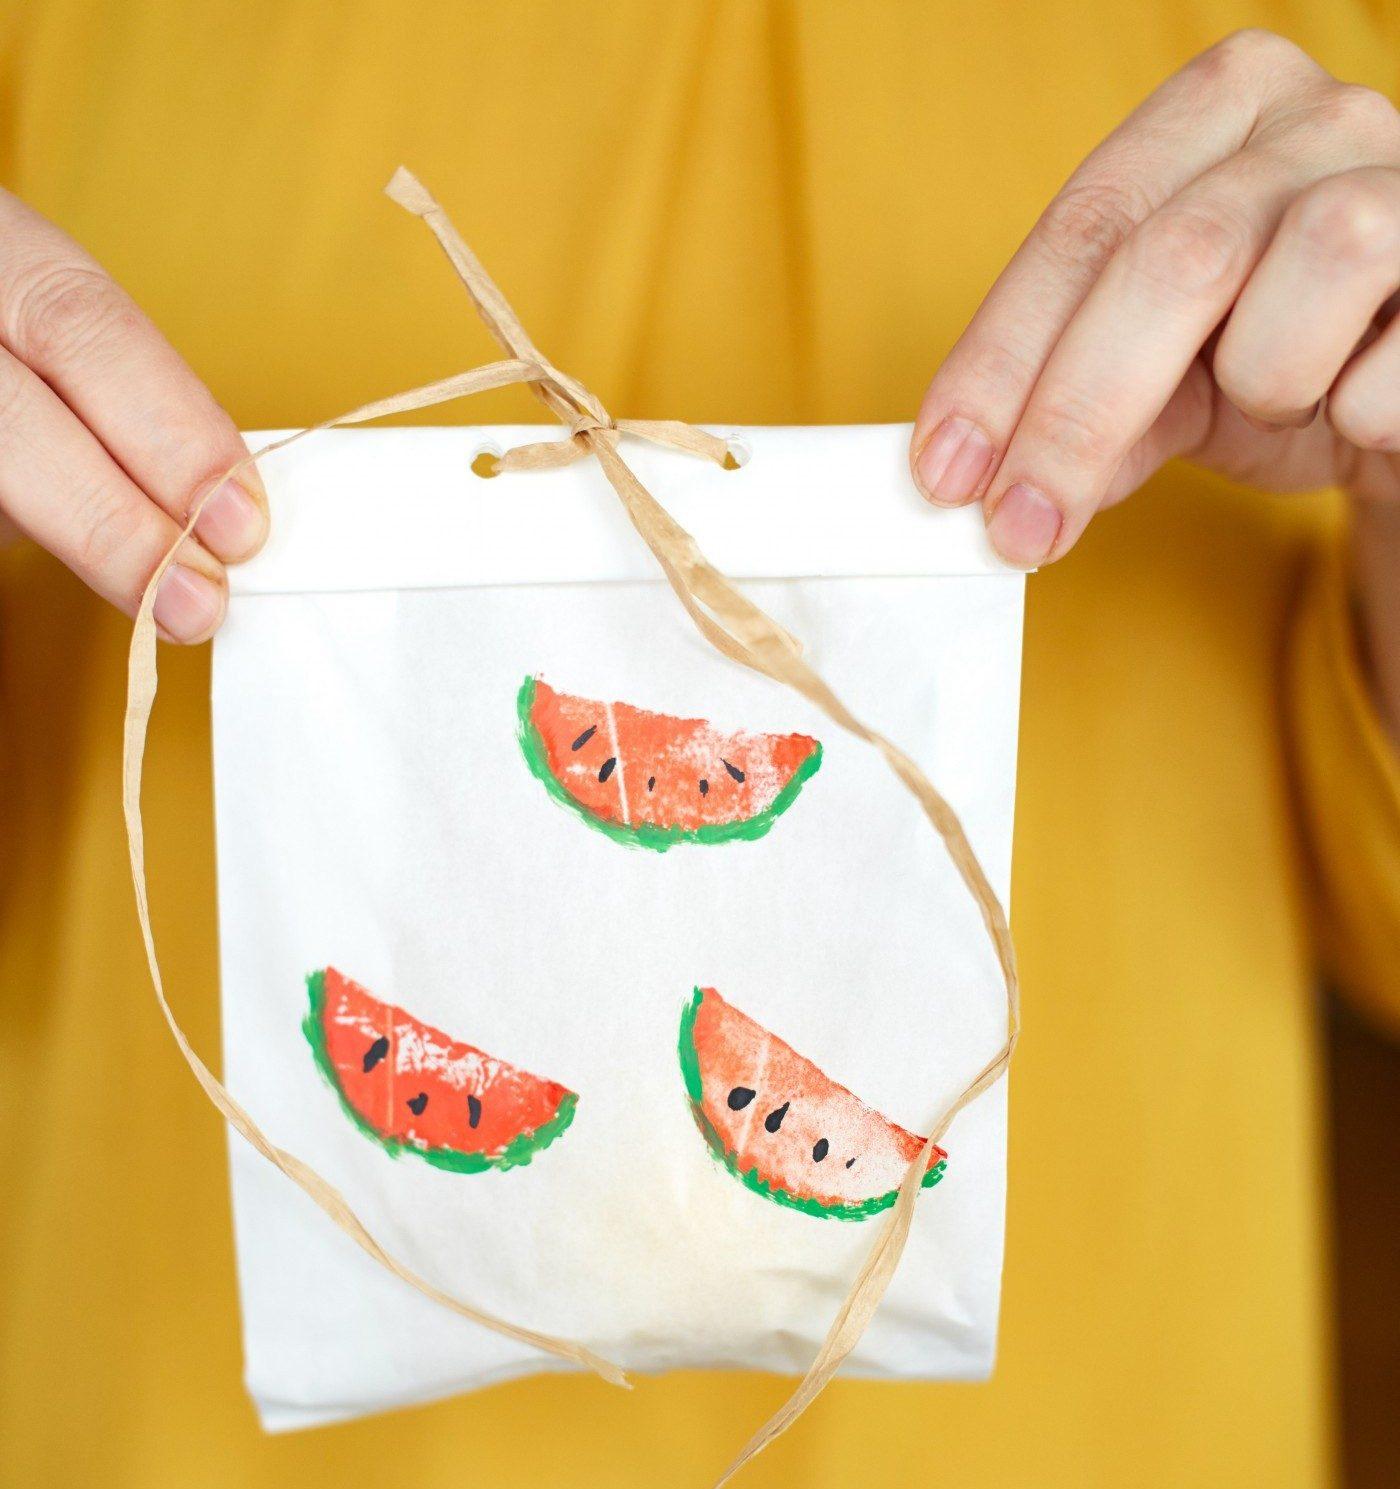 Arbūzai dekoruotas maišelis